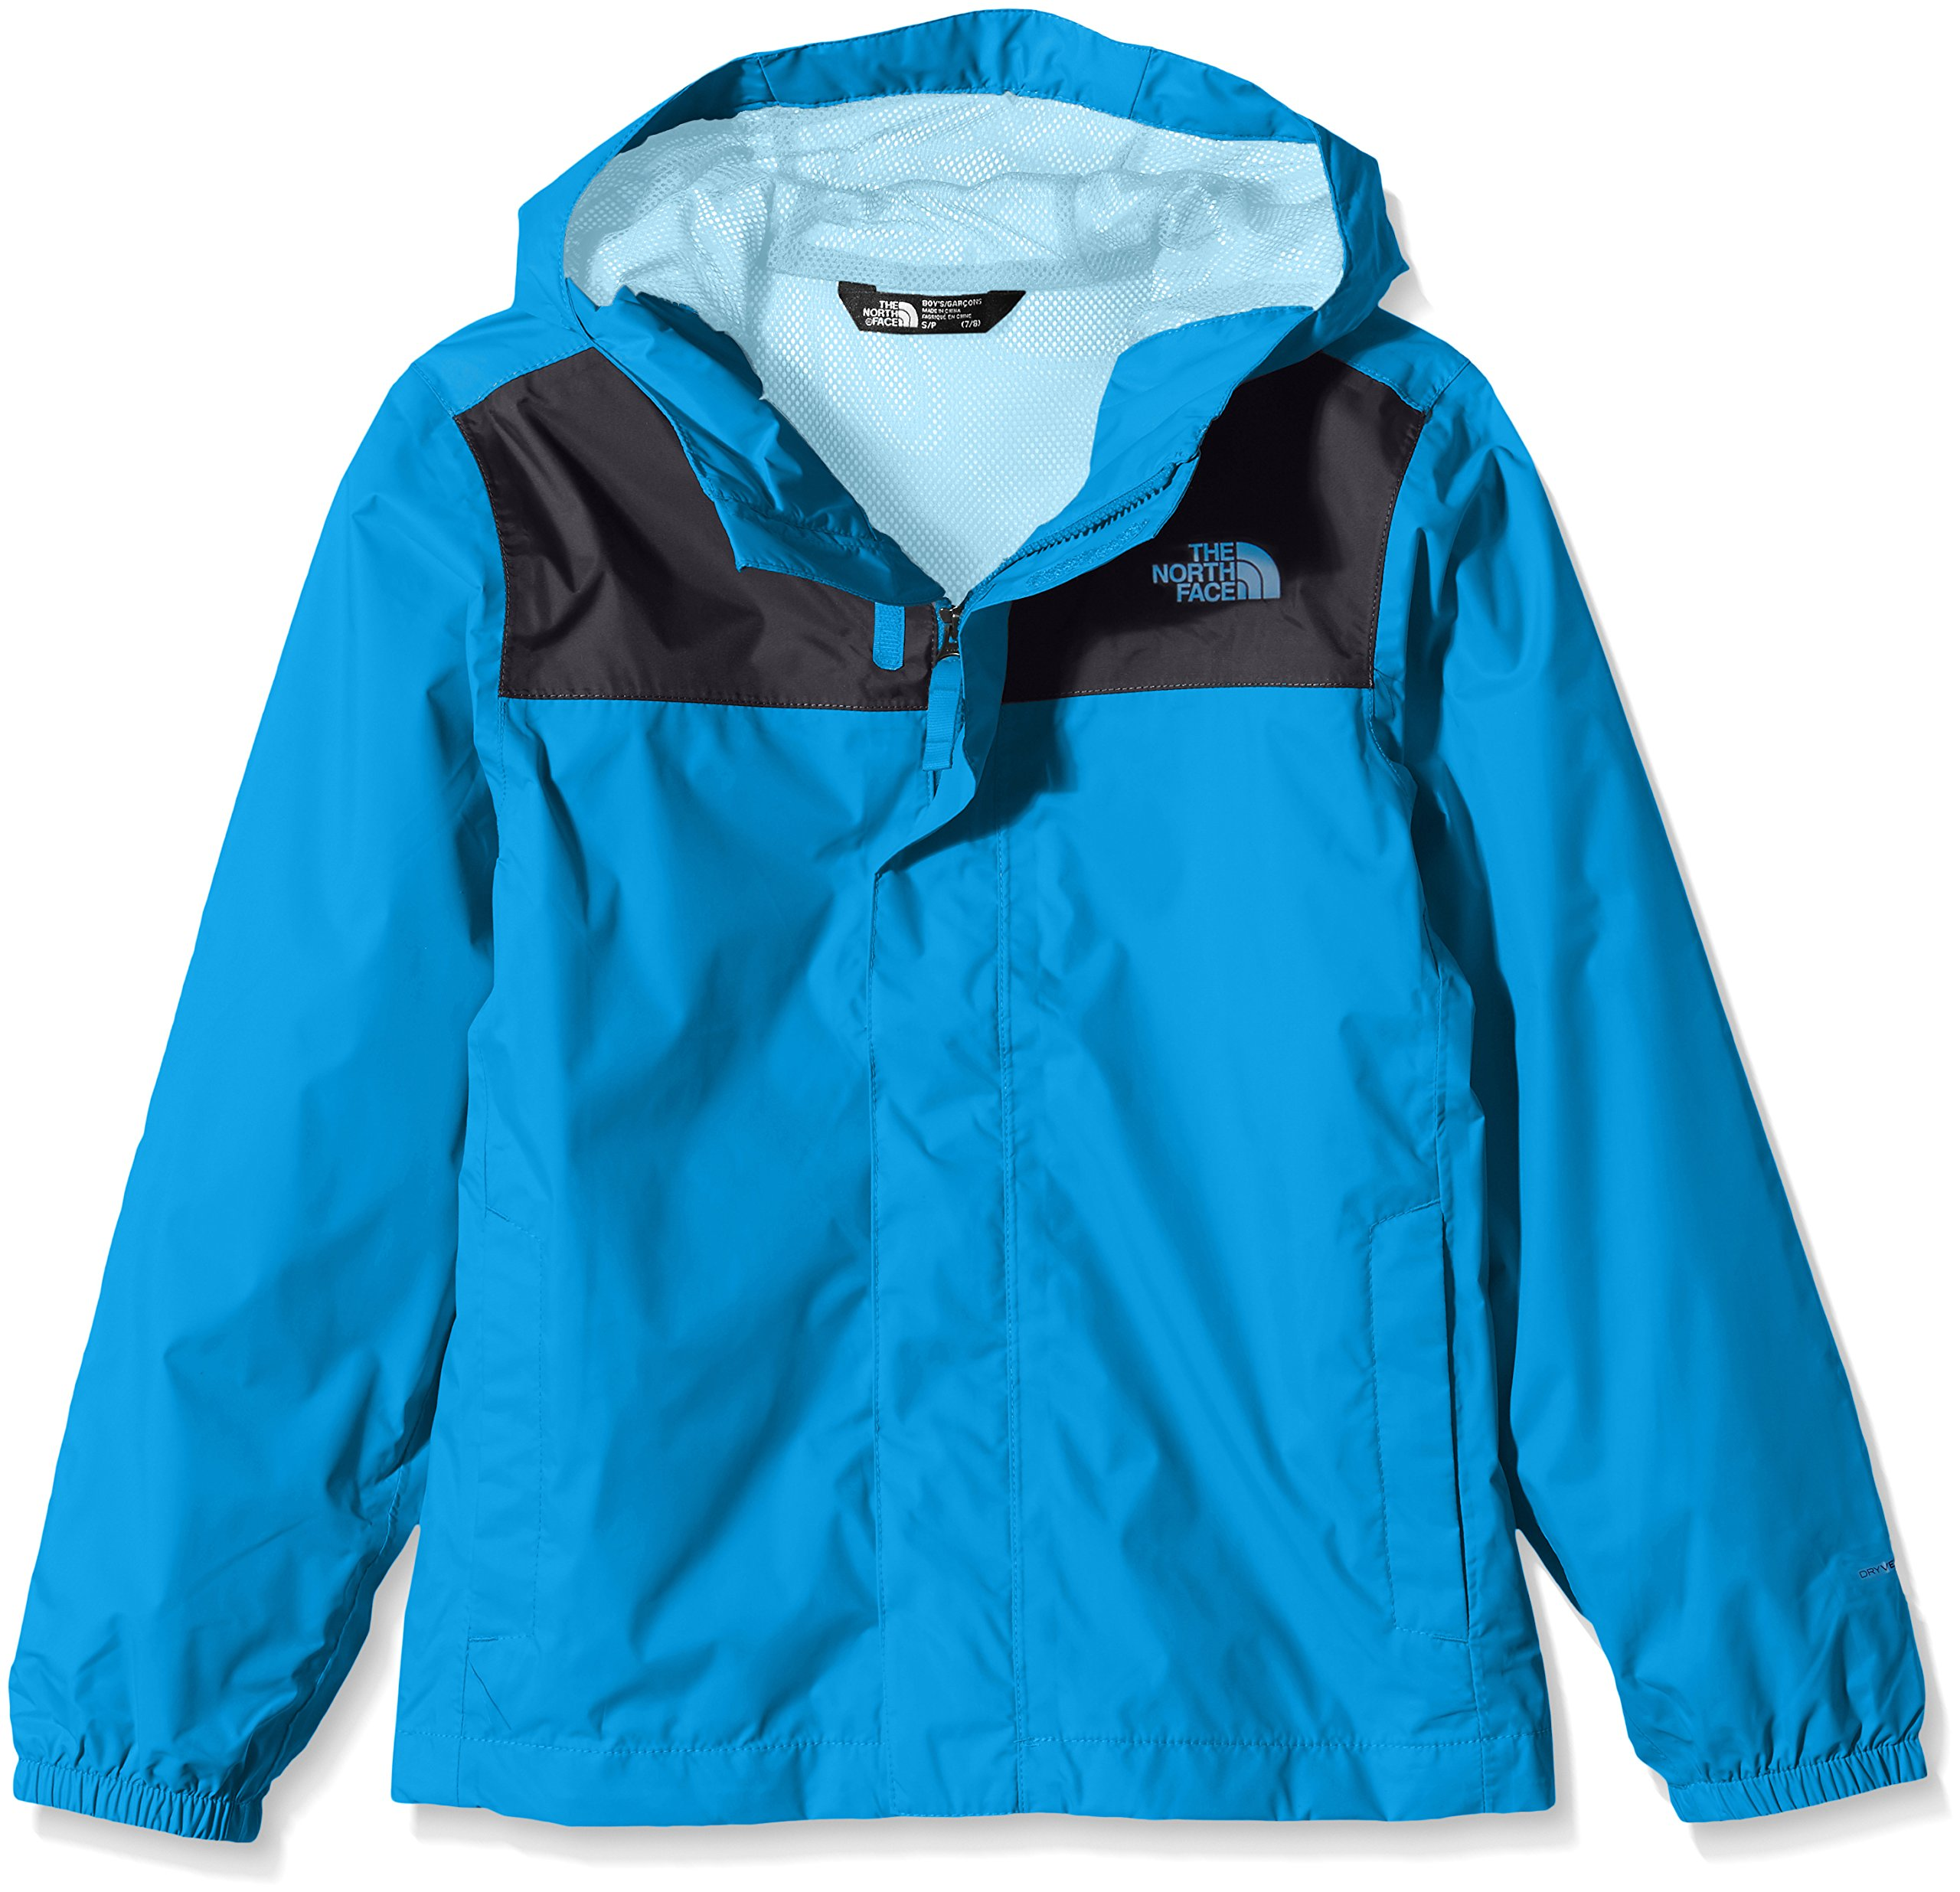 The North Face Big Boys Zipline Rain Jacket - clear lake blue, m/10-12